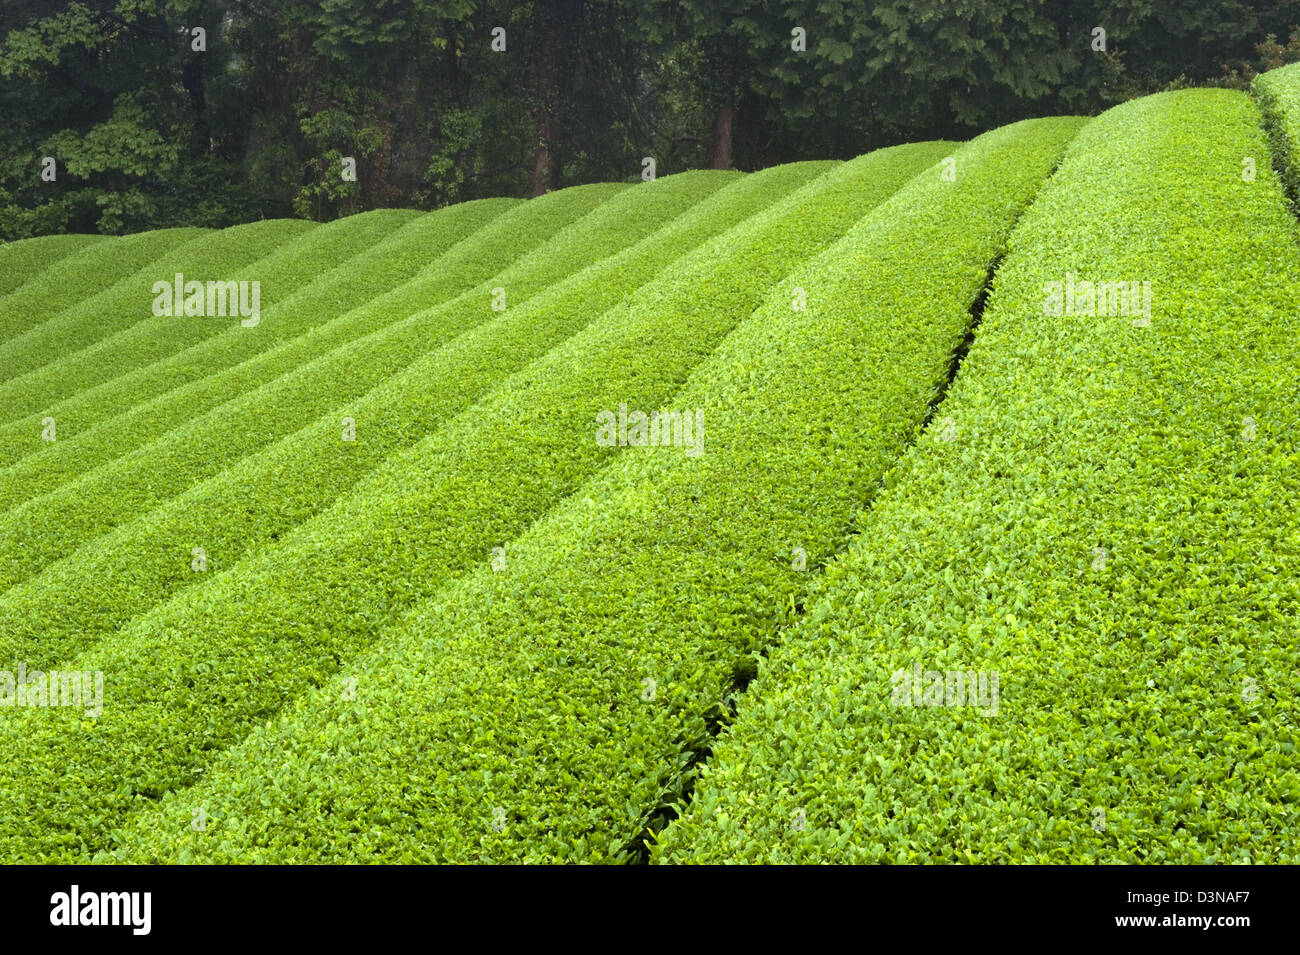 how to grow green tea